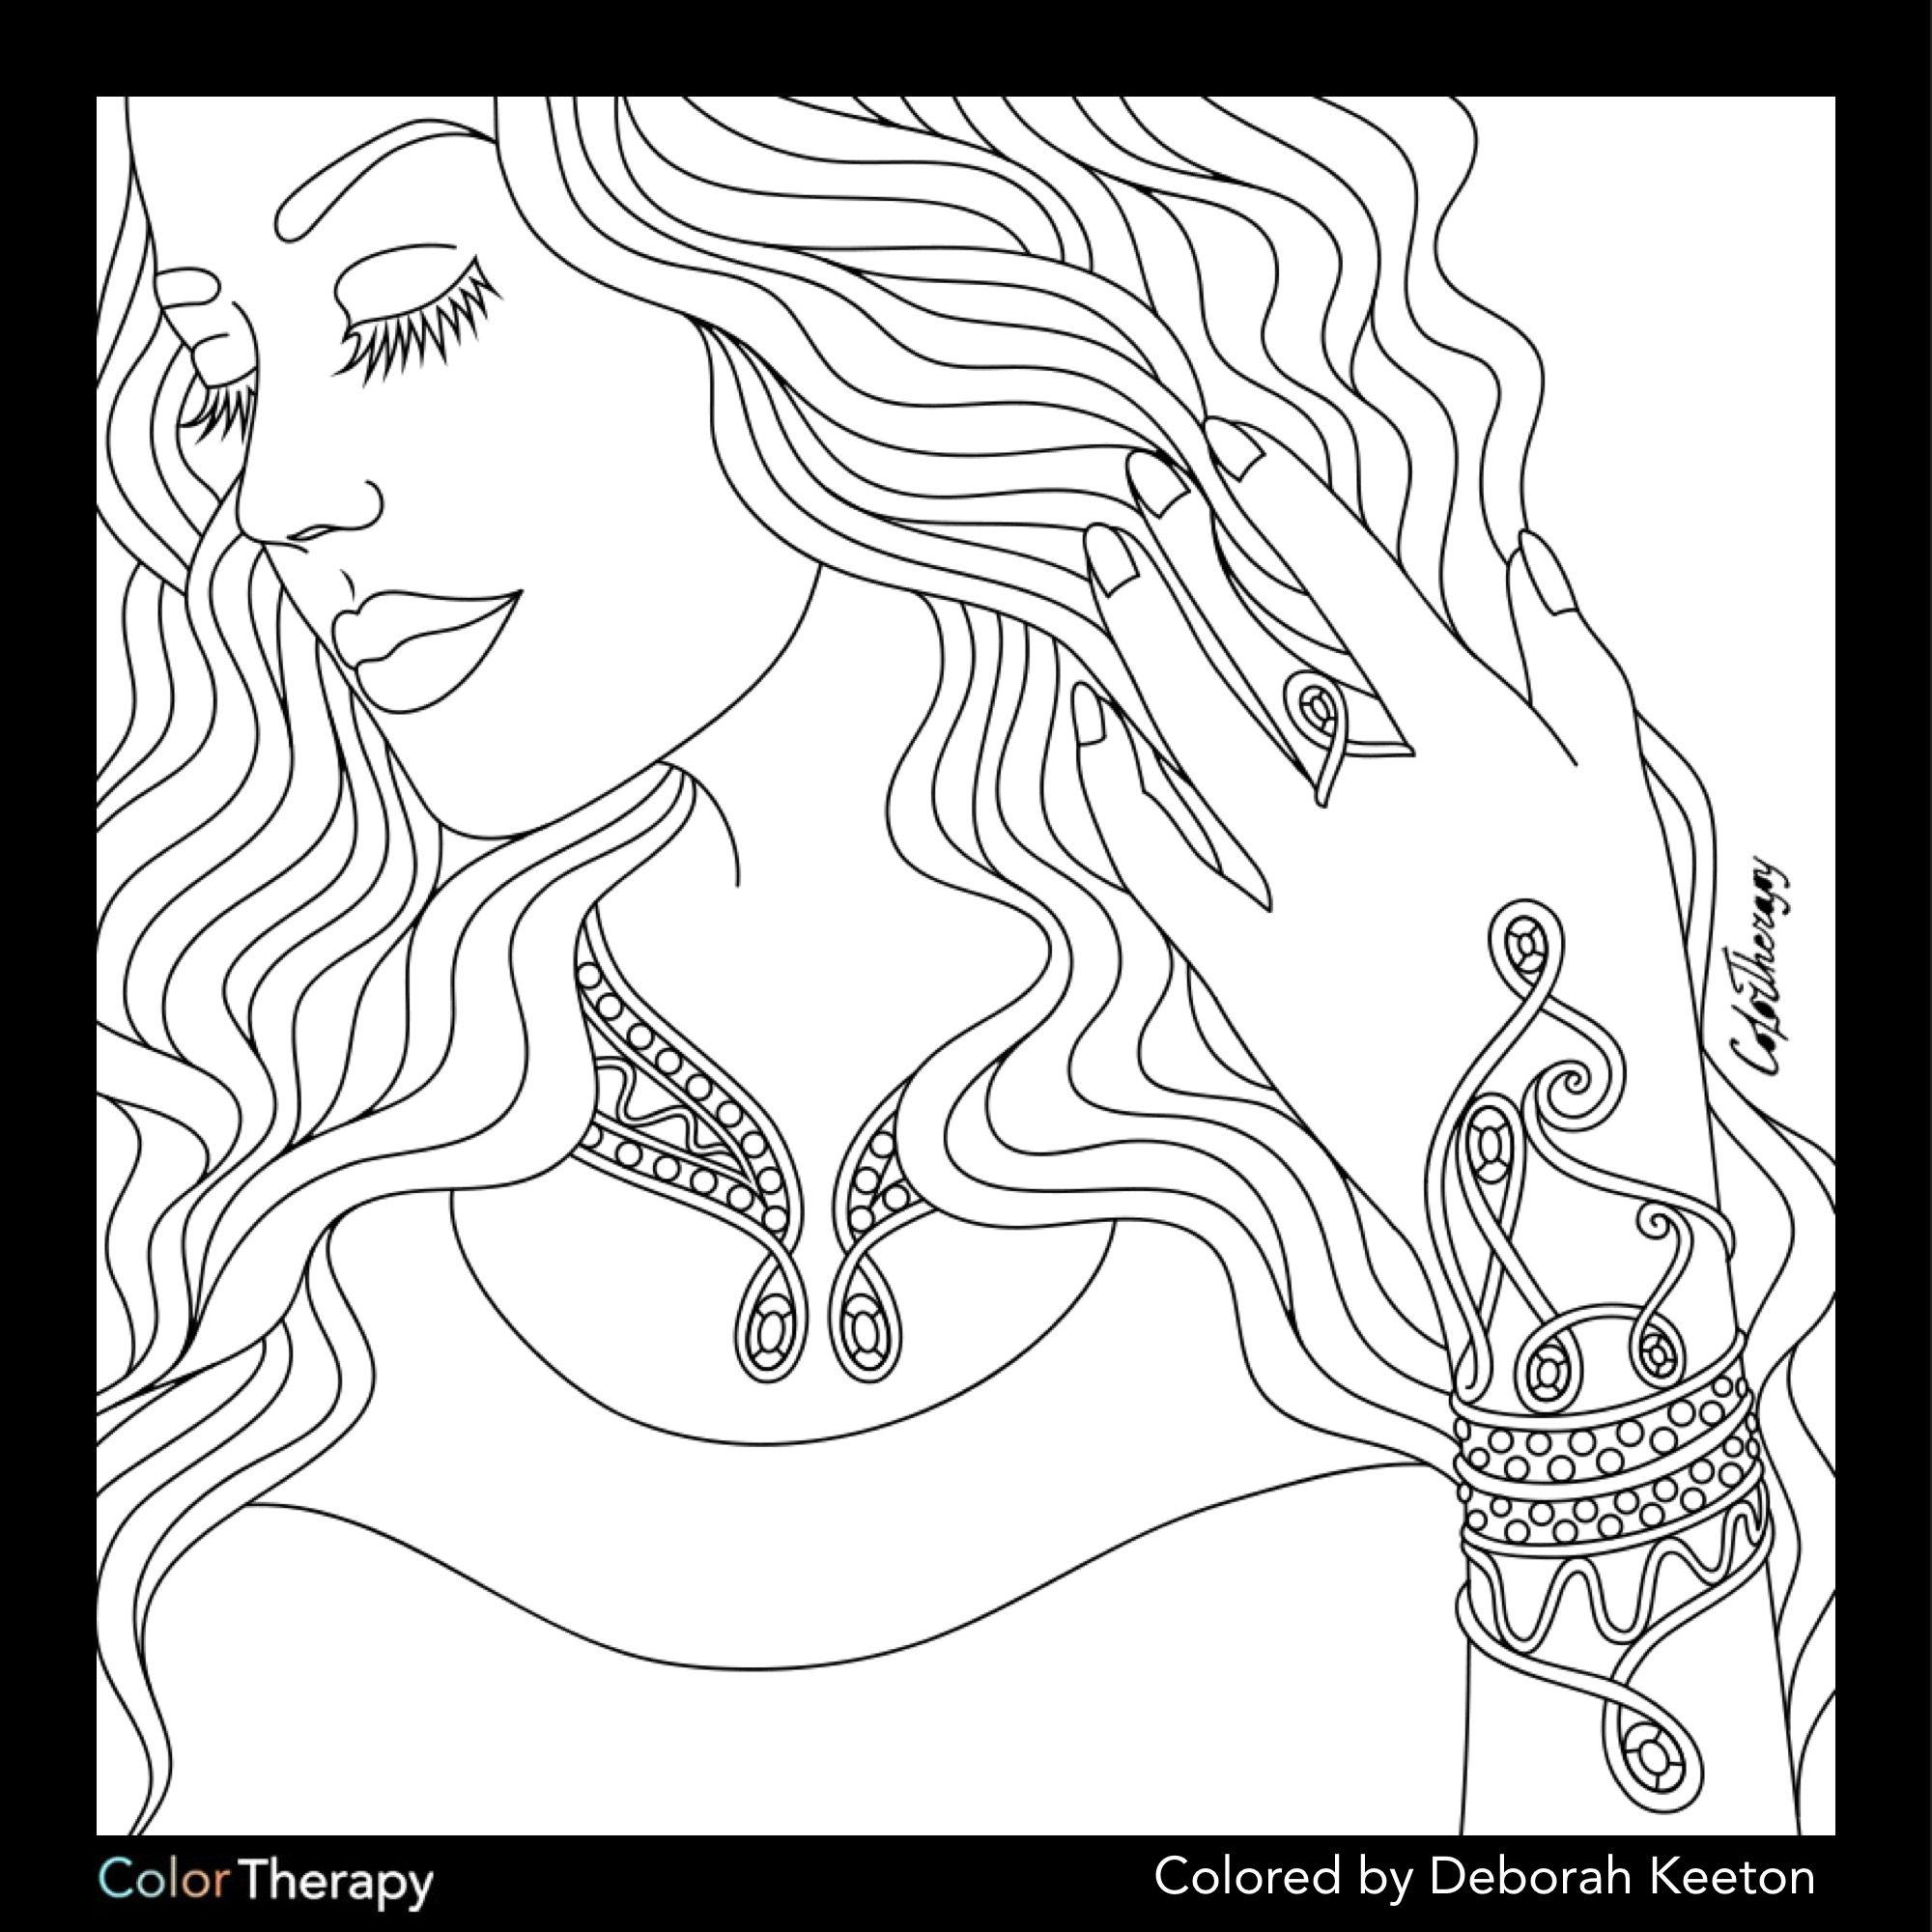 Pin de Journey Yourself Creative en Coloring   Pinterest   Grabado ...